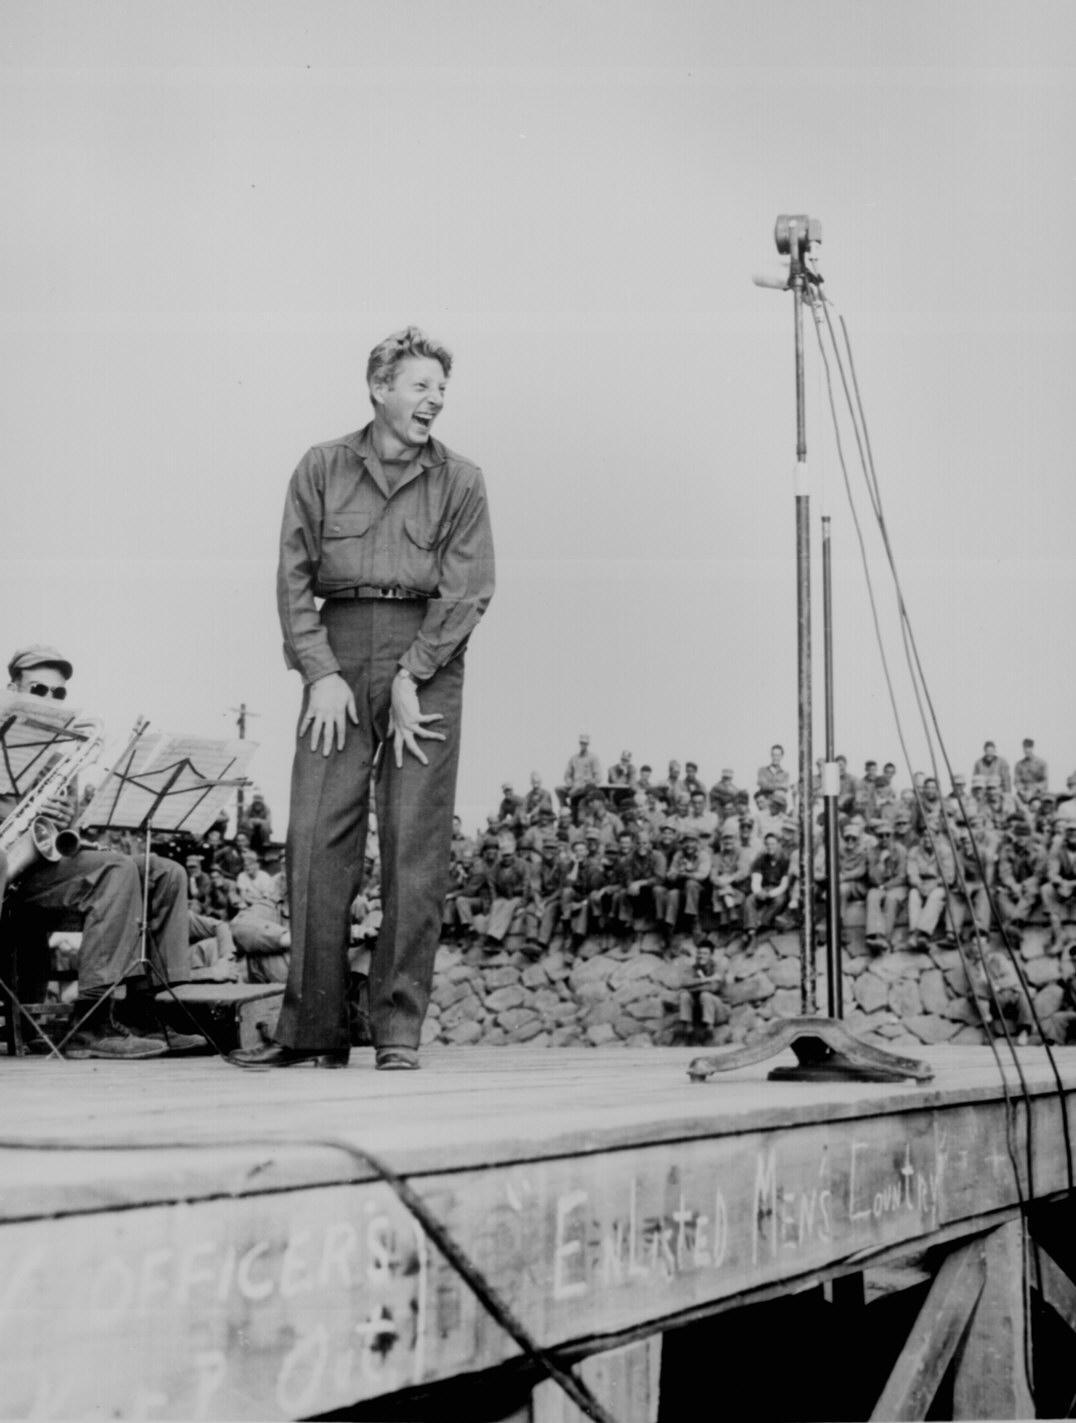 Danny Kaye Entertaining Troops During World War Ii